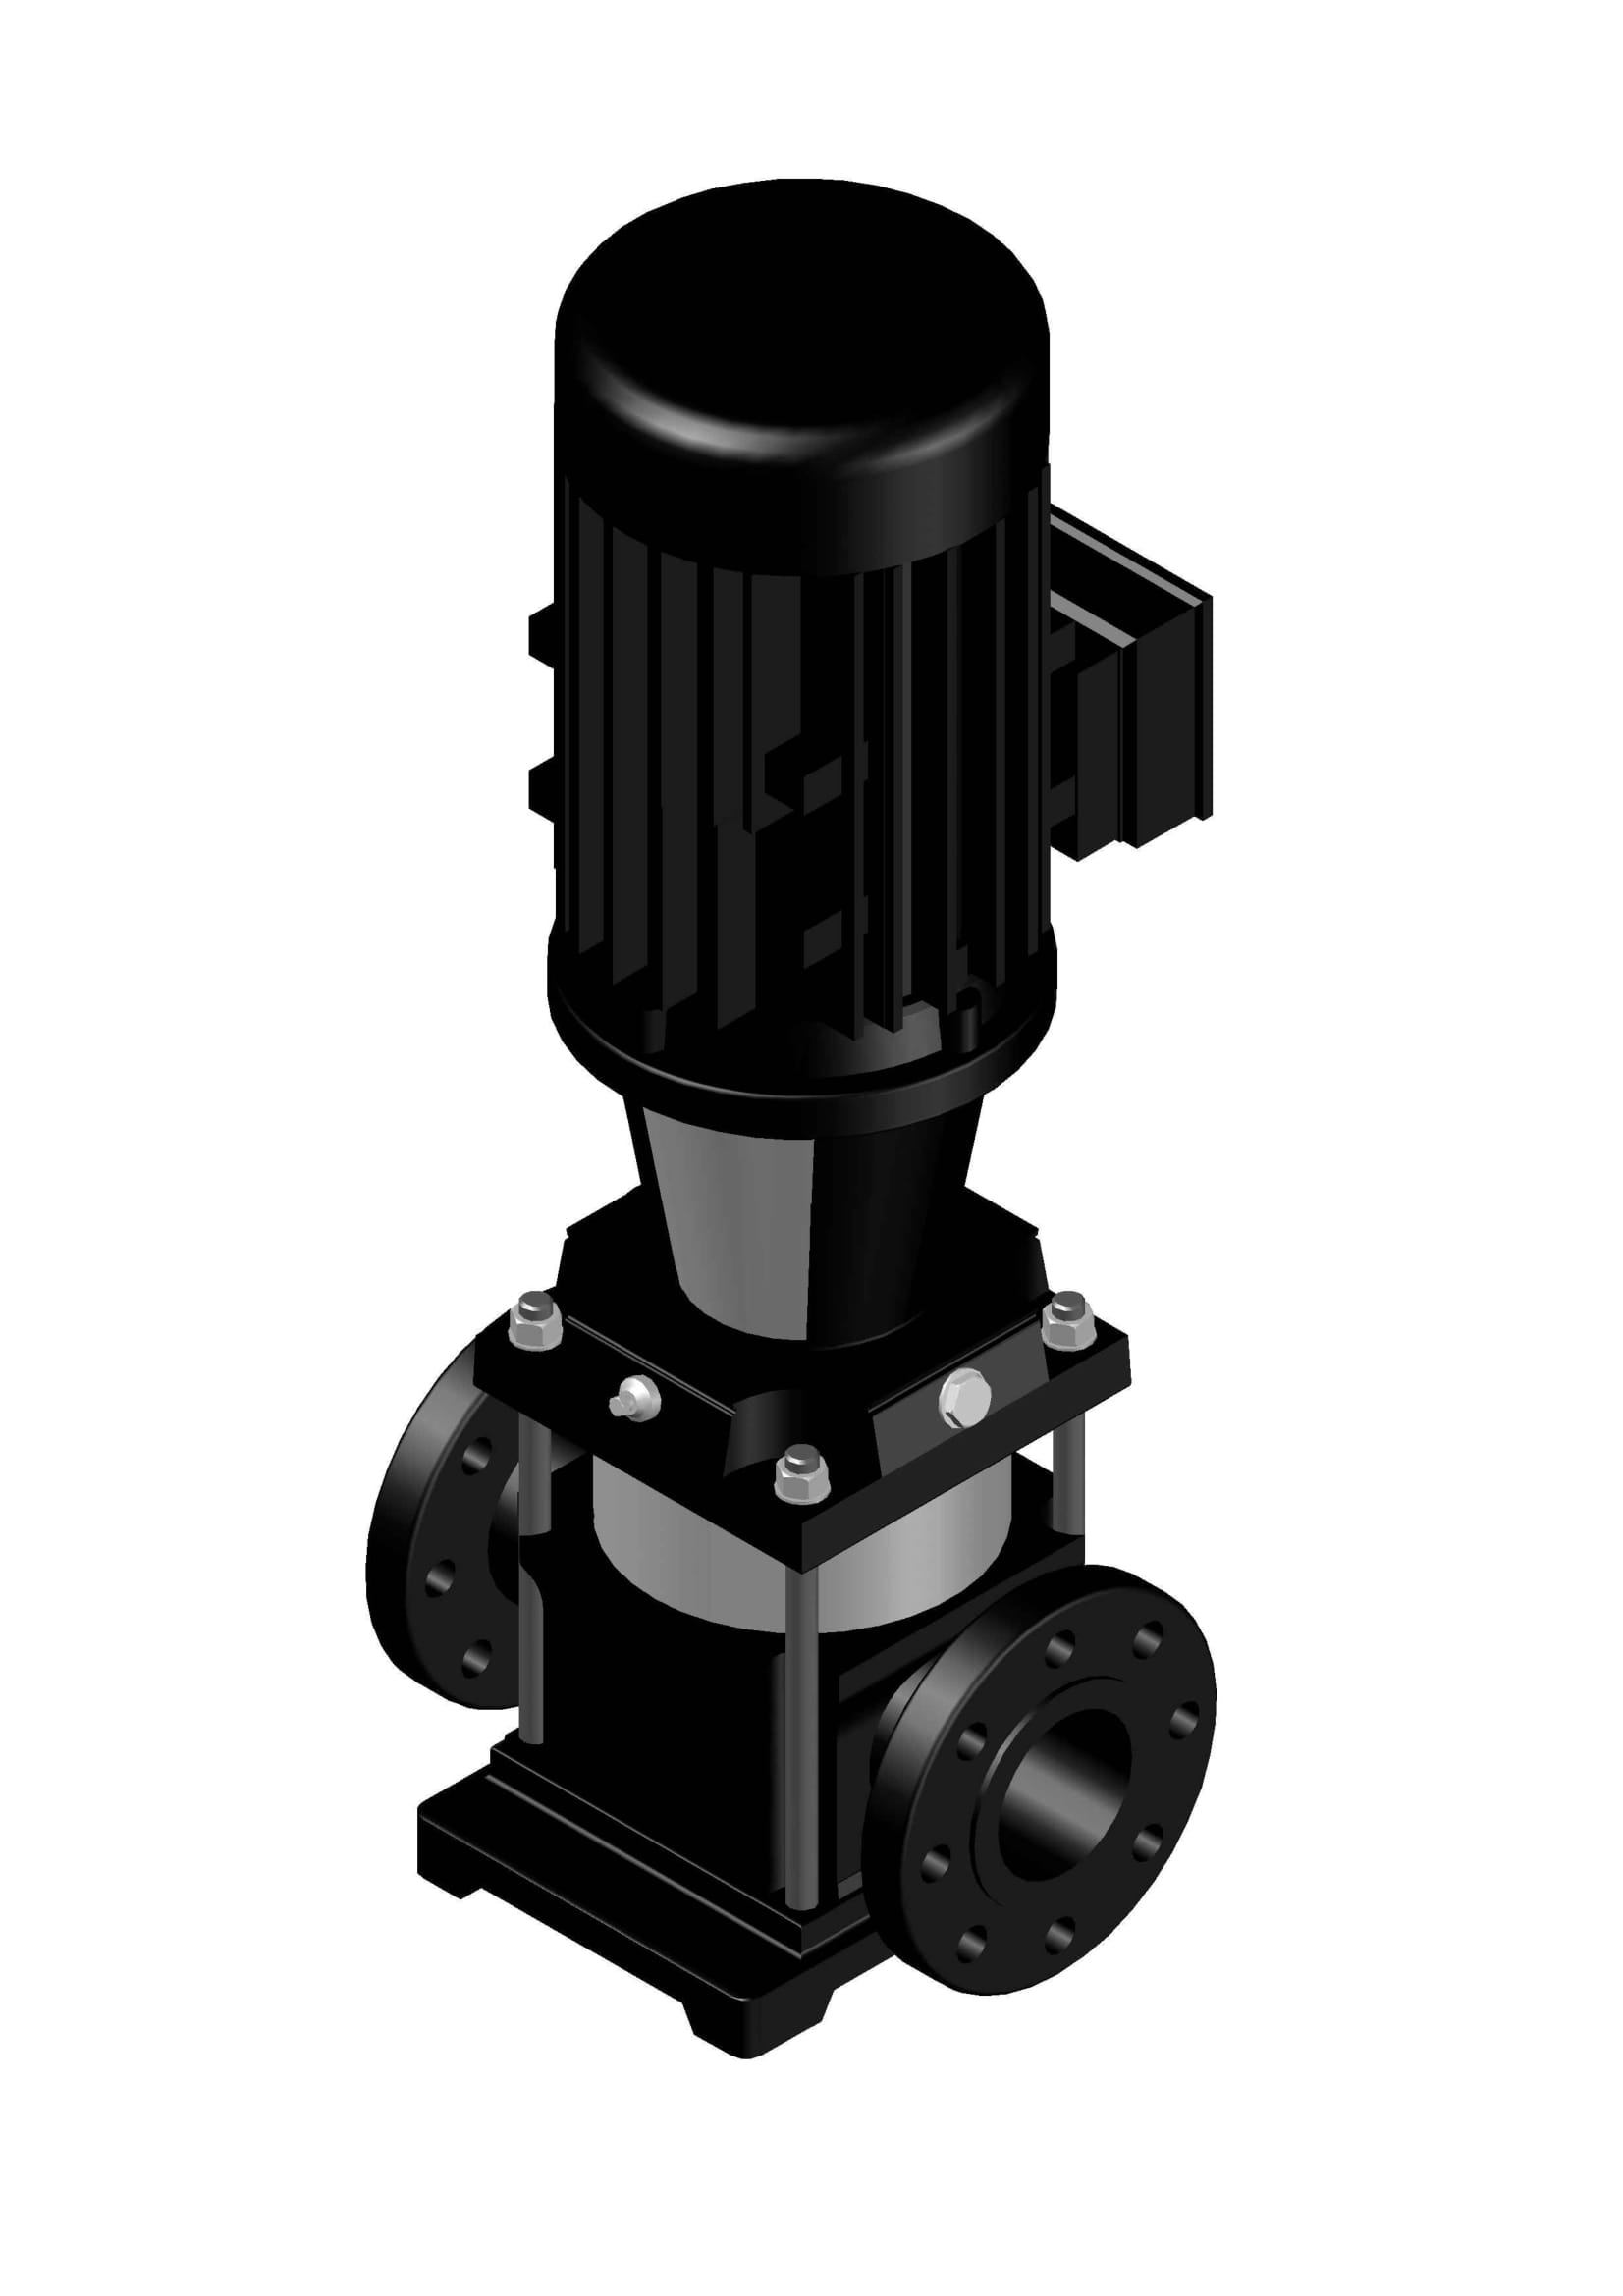 BV 64-01